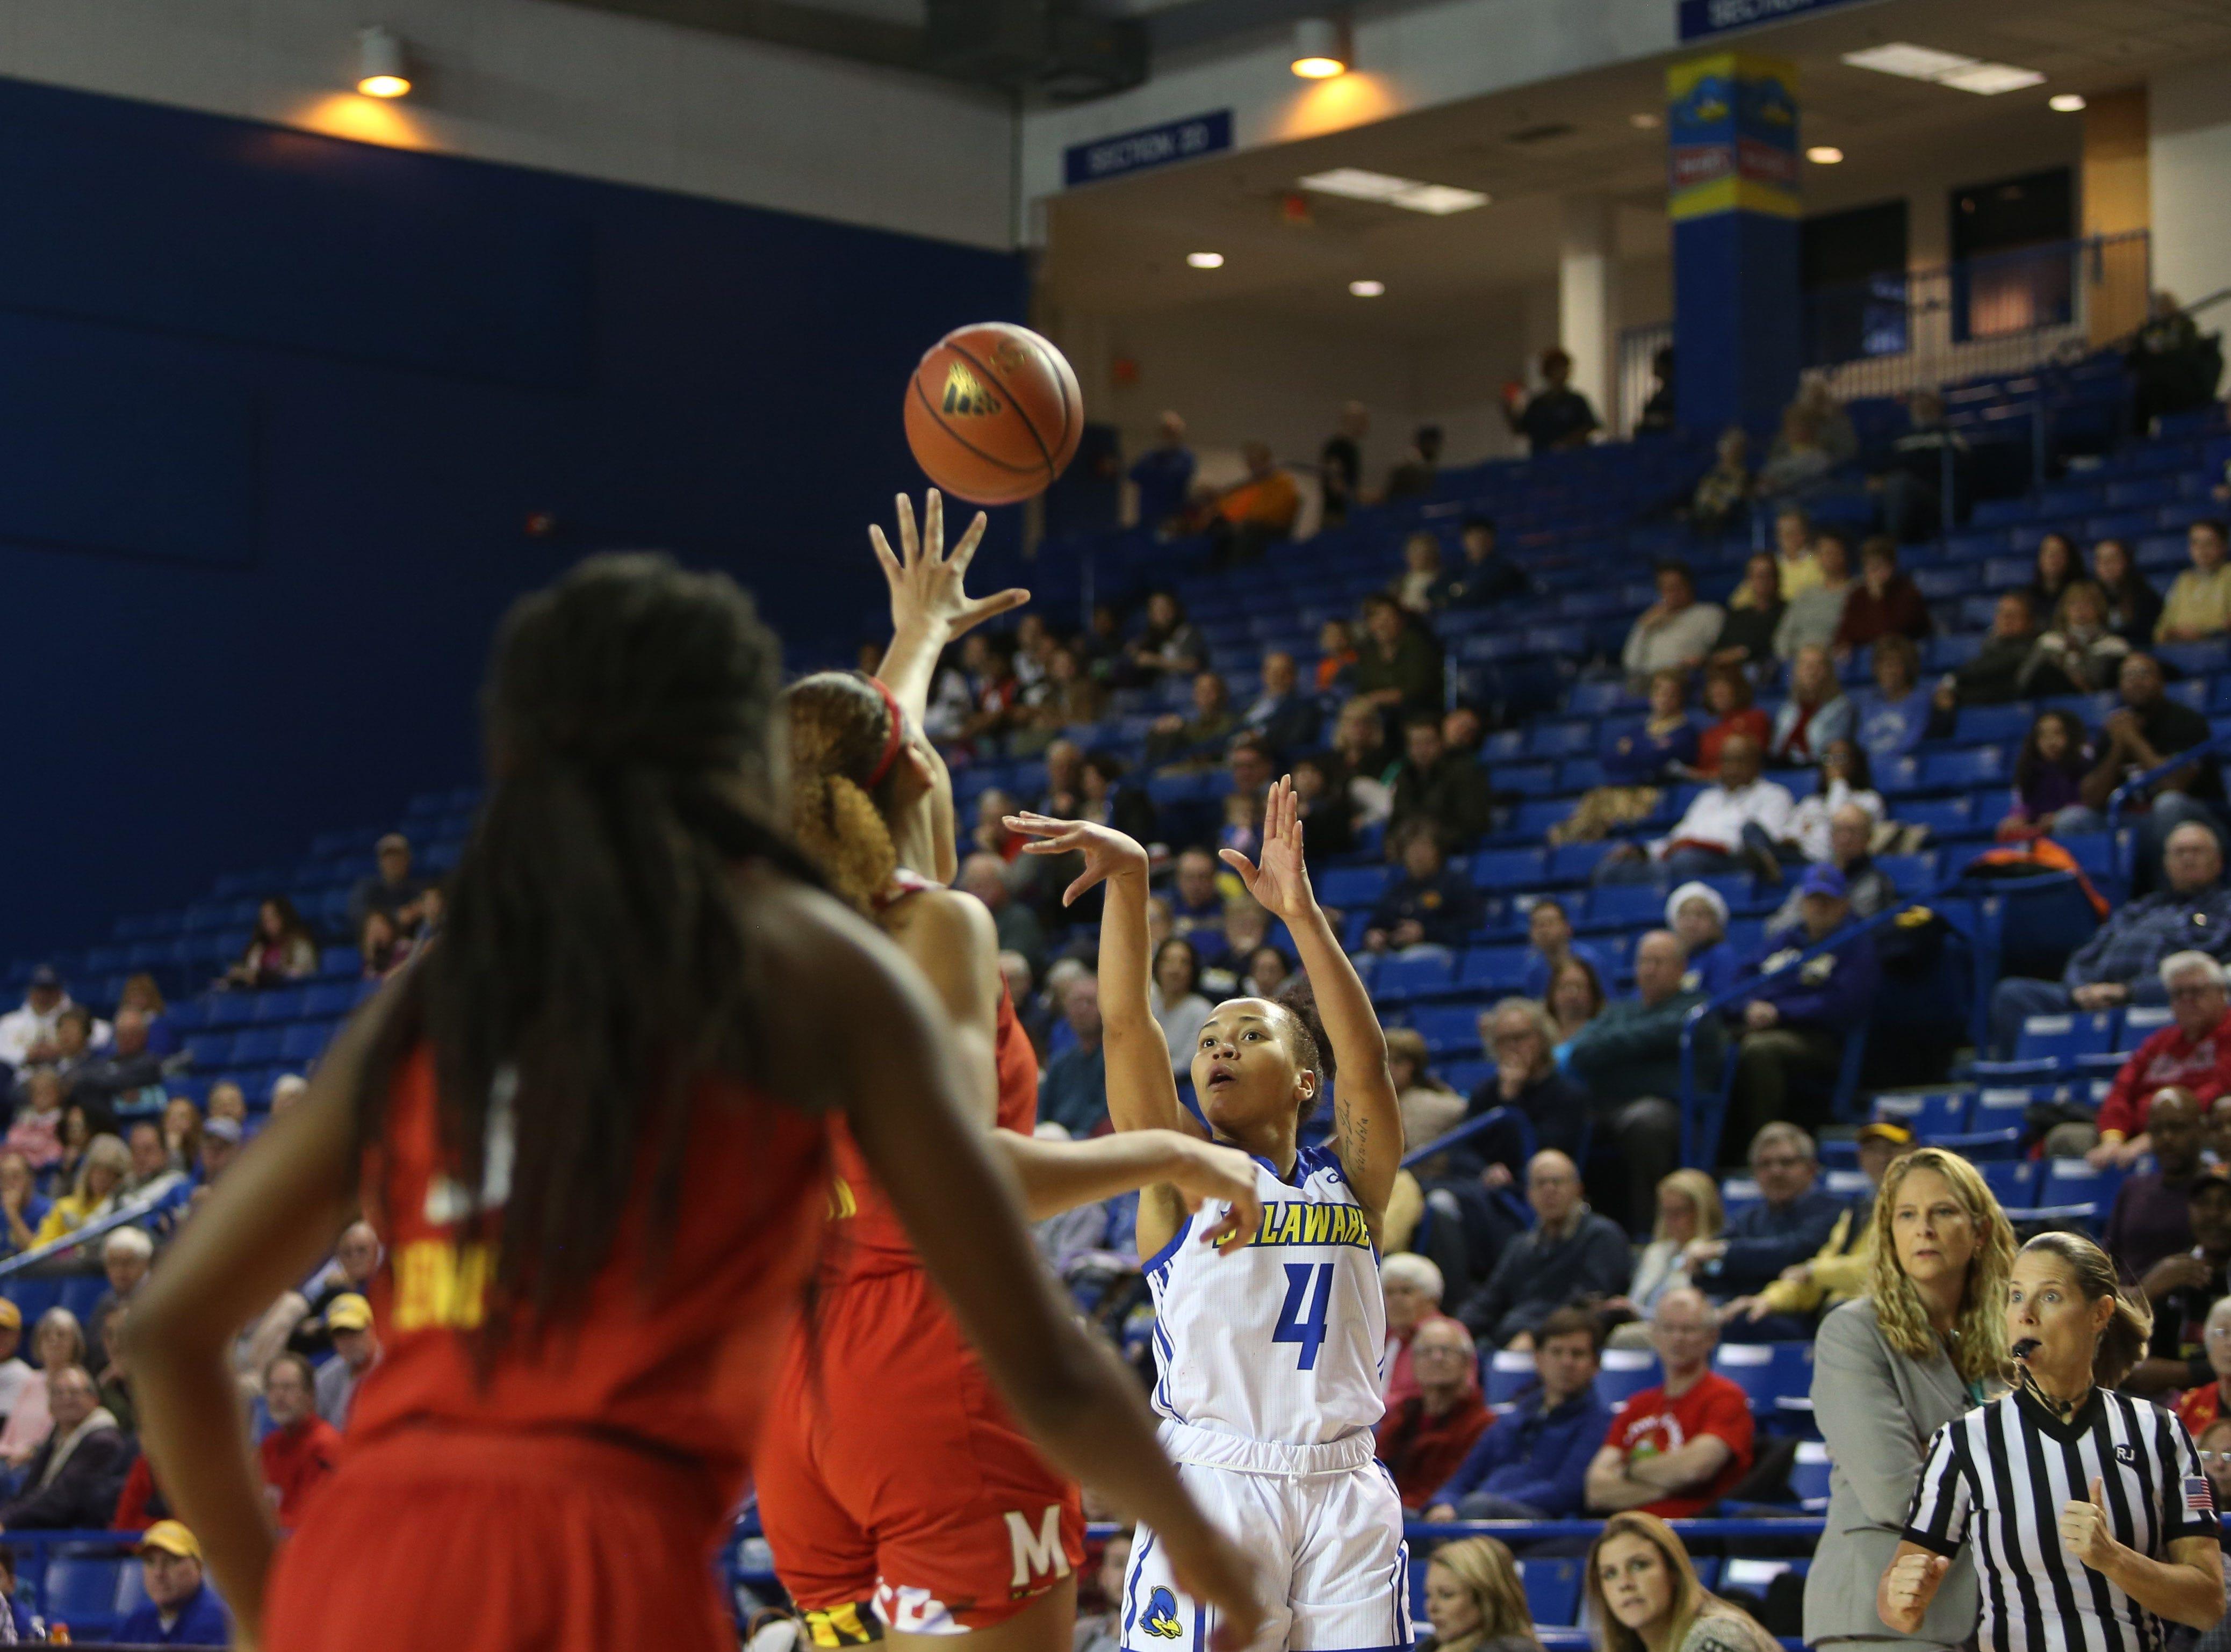 Delaware freshman guard Paris McBride shoots over the Maryland defense. The University of Delaware women's basketball team takes on No. 5 University of Maryland at the Bob Carpenter Center Thursday.